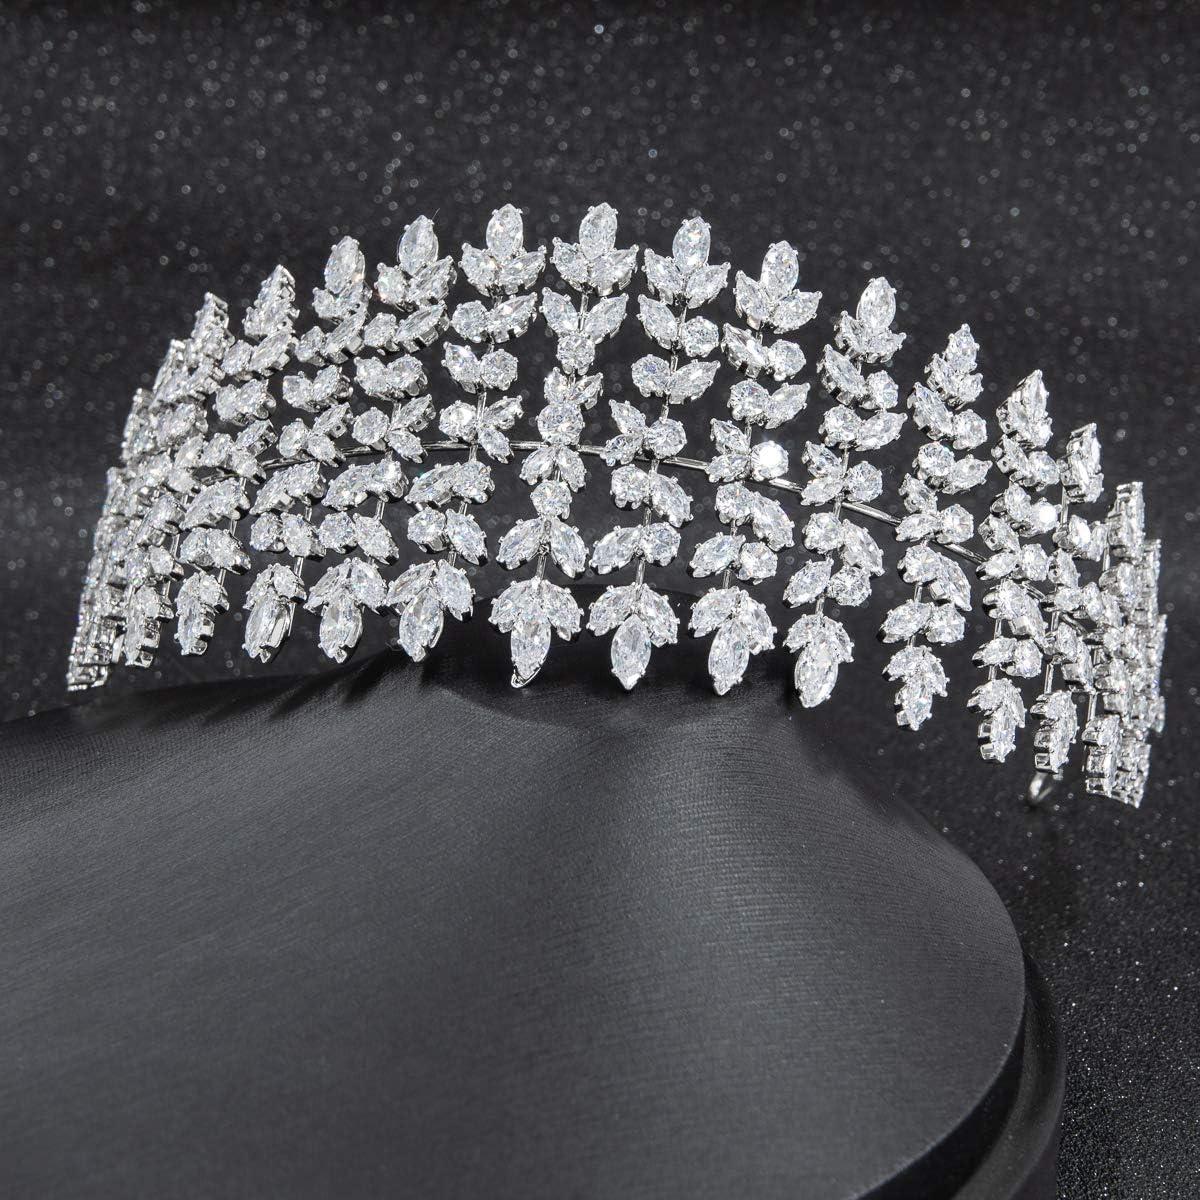 Big Crystals Cubic Zirconia Wedding Bridal Soft Headband Hairband Tiara Hair Accessories A01921